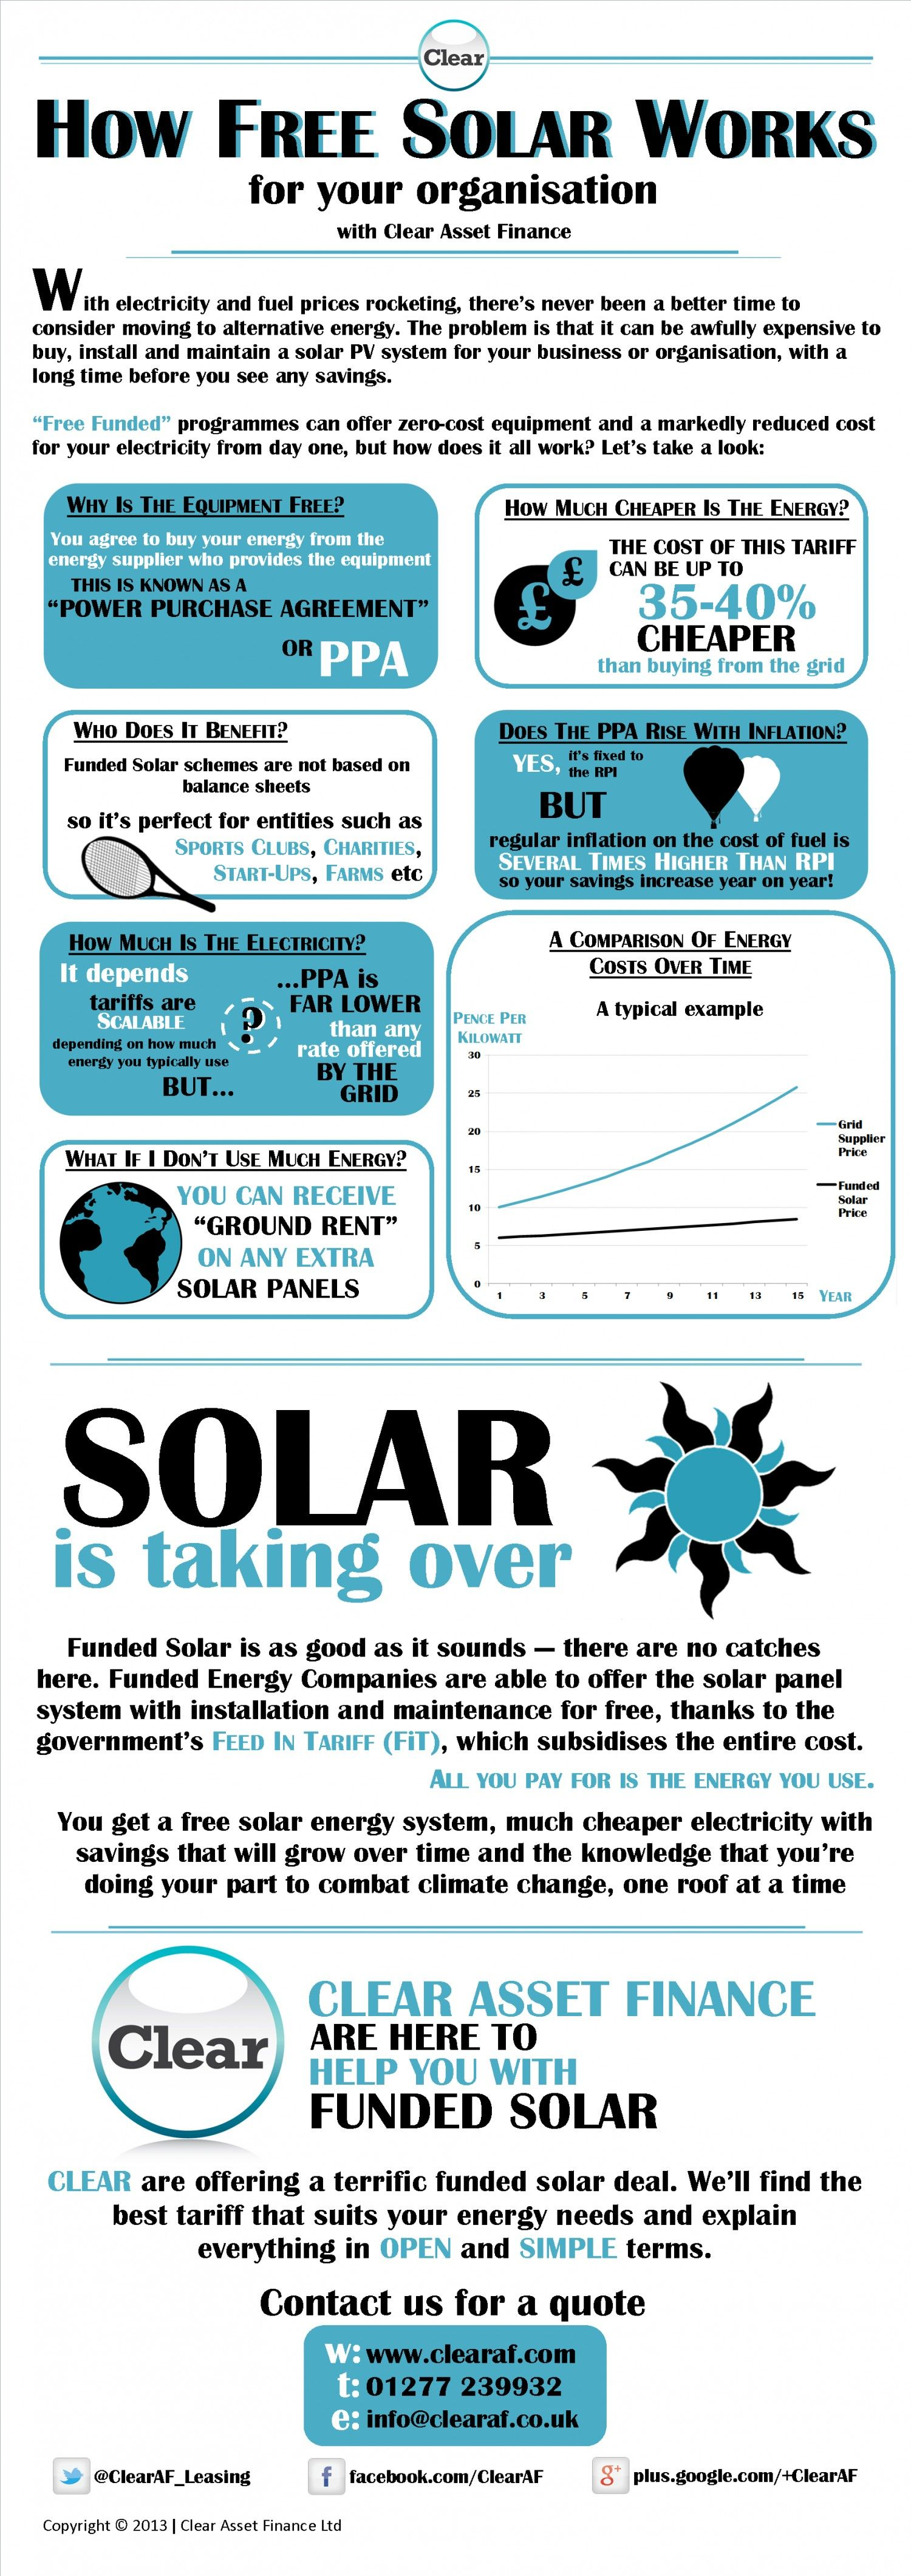 How Free Solar Works Visual.ly Free solar, Solar